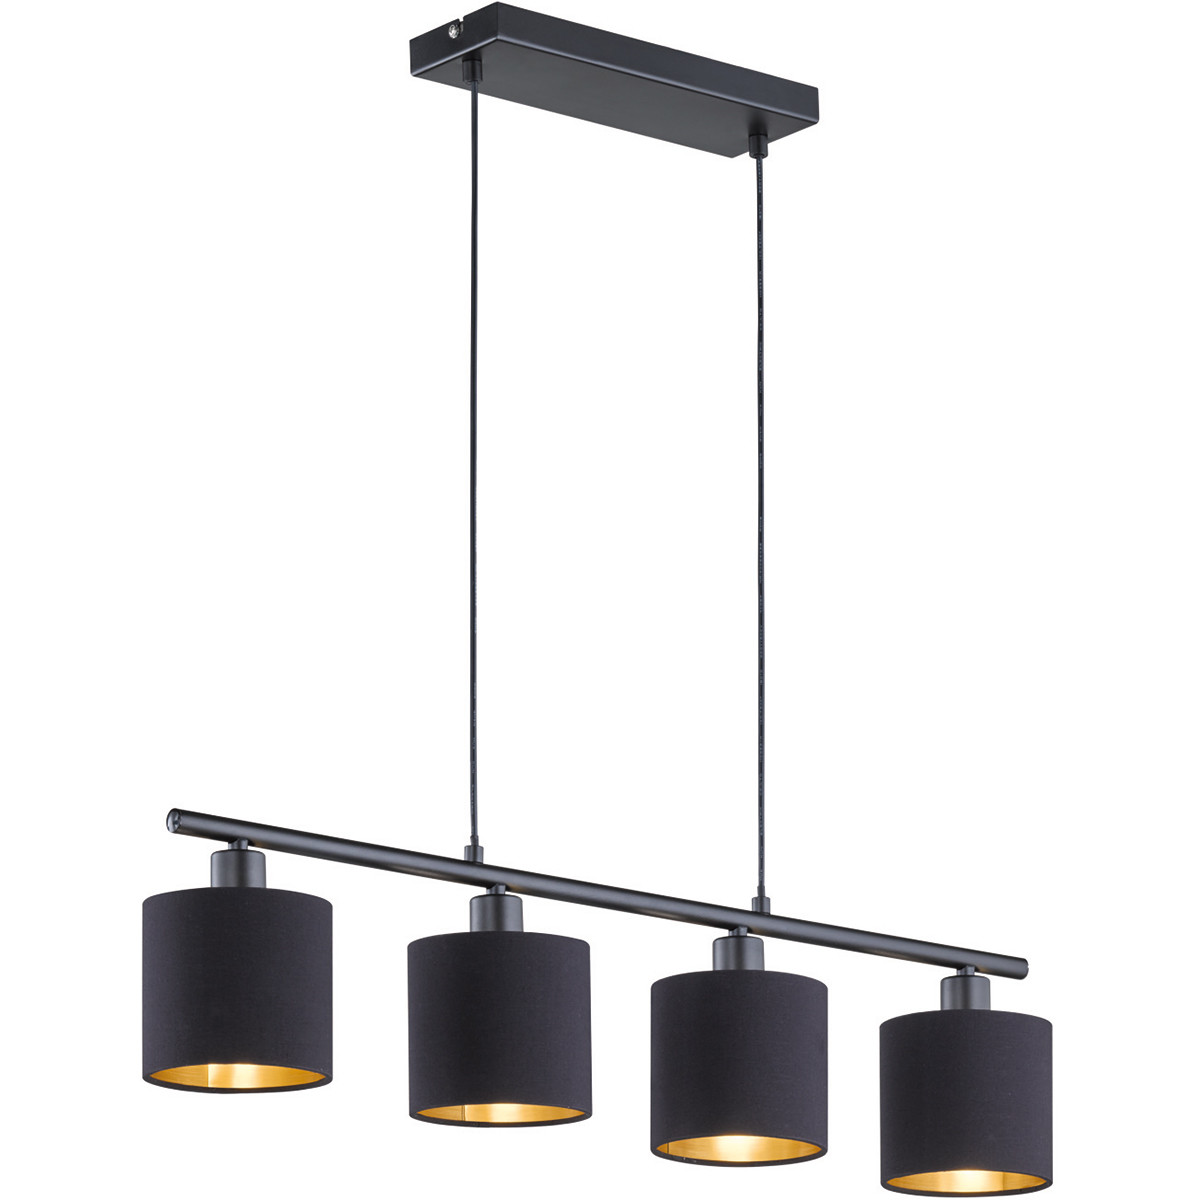 LED Hanglamp - Trion Torry - E14 Fitting - Rechthoek - Mat Zwart - Aluminium